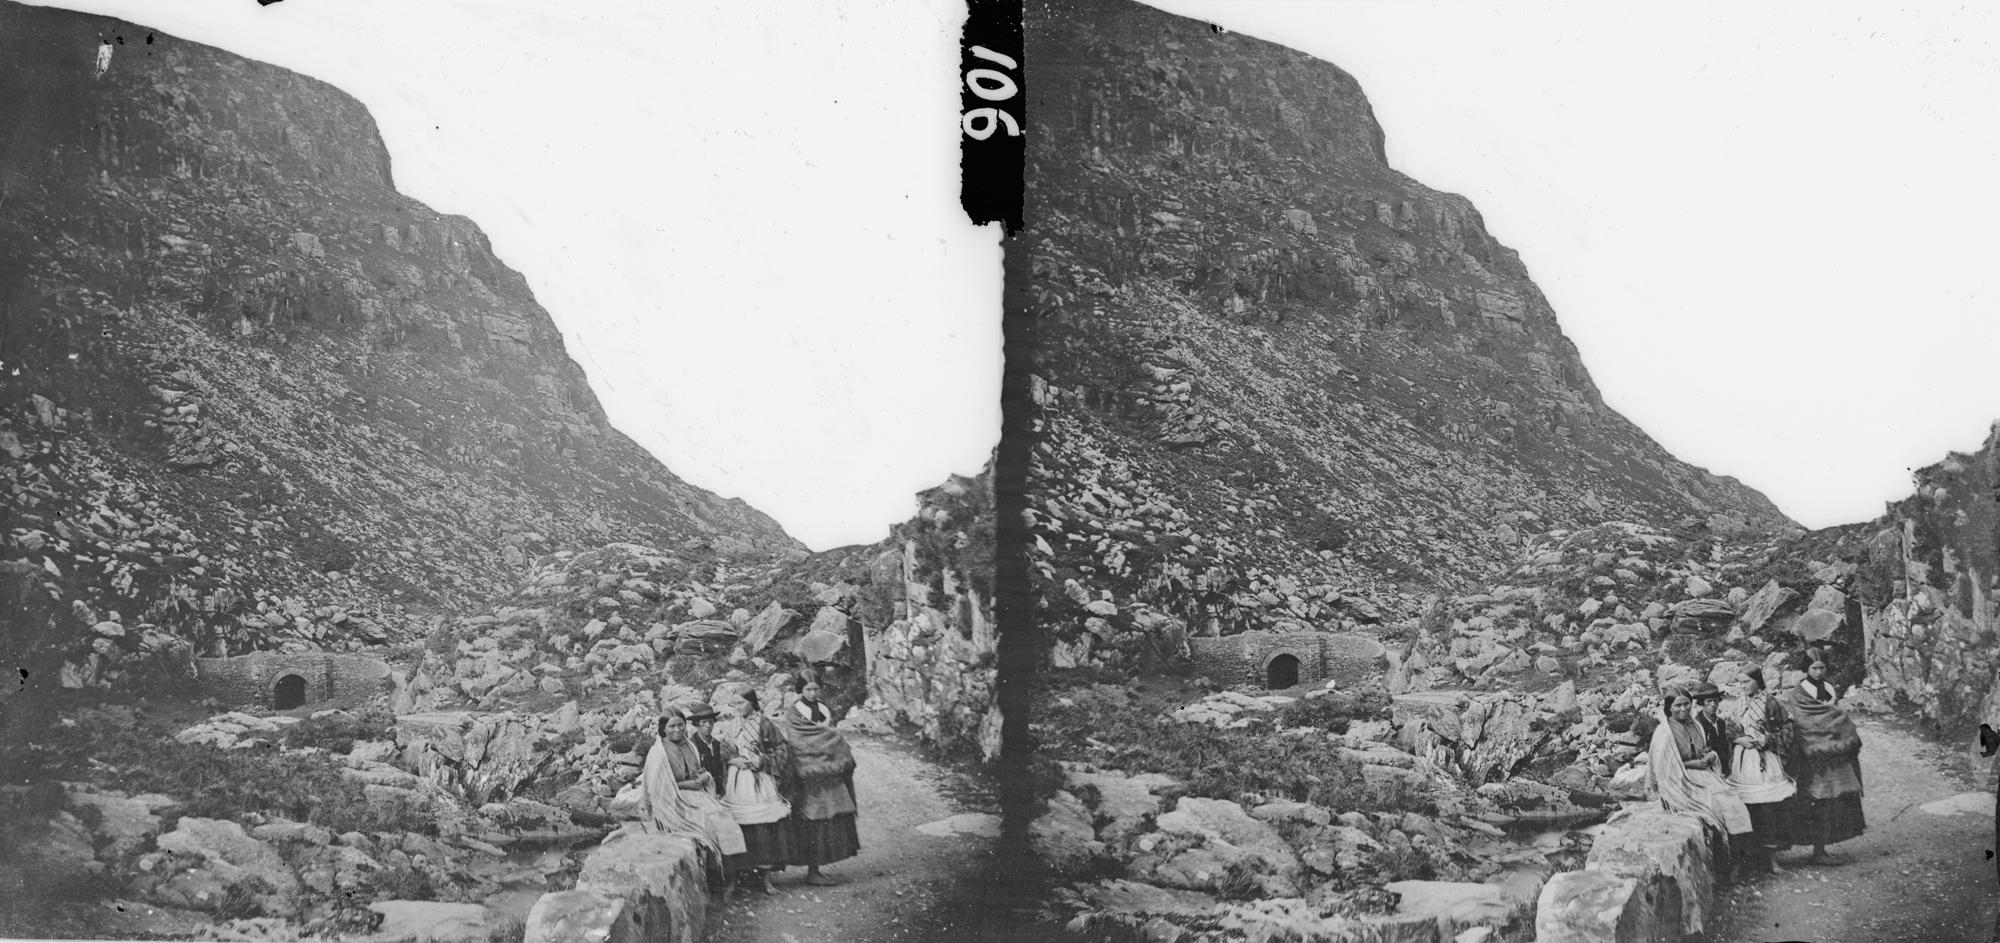 Gap of Dunloe, Dunloe, Co. Kerry